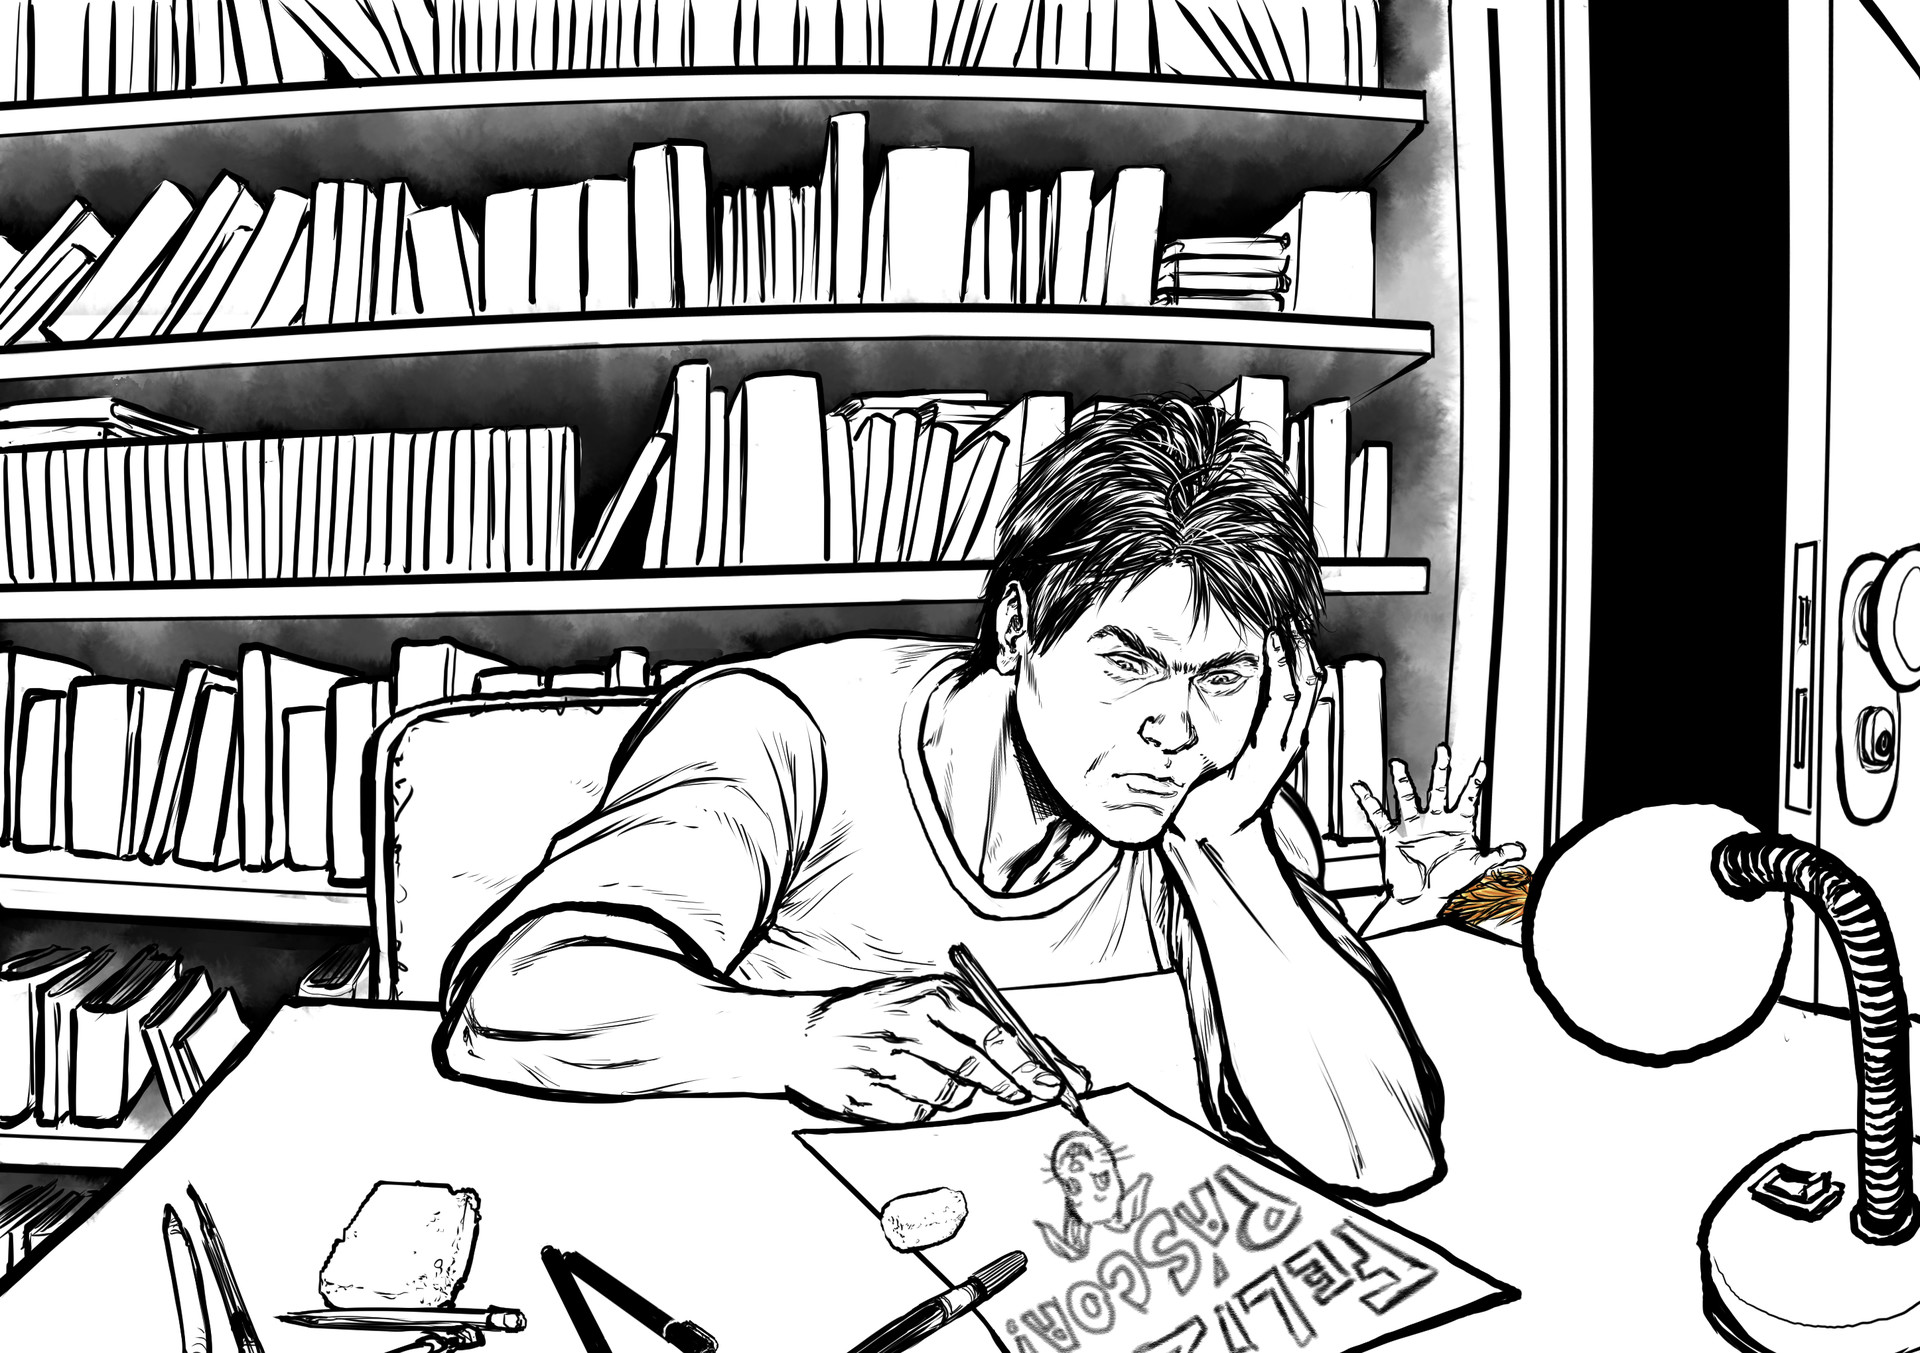 Gustavo melo dida do desenhista pascoa